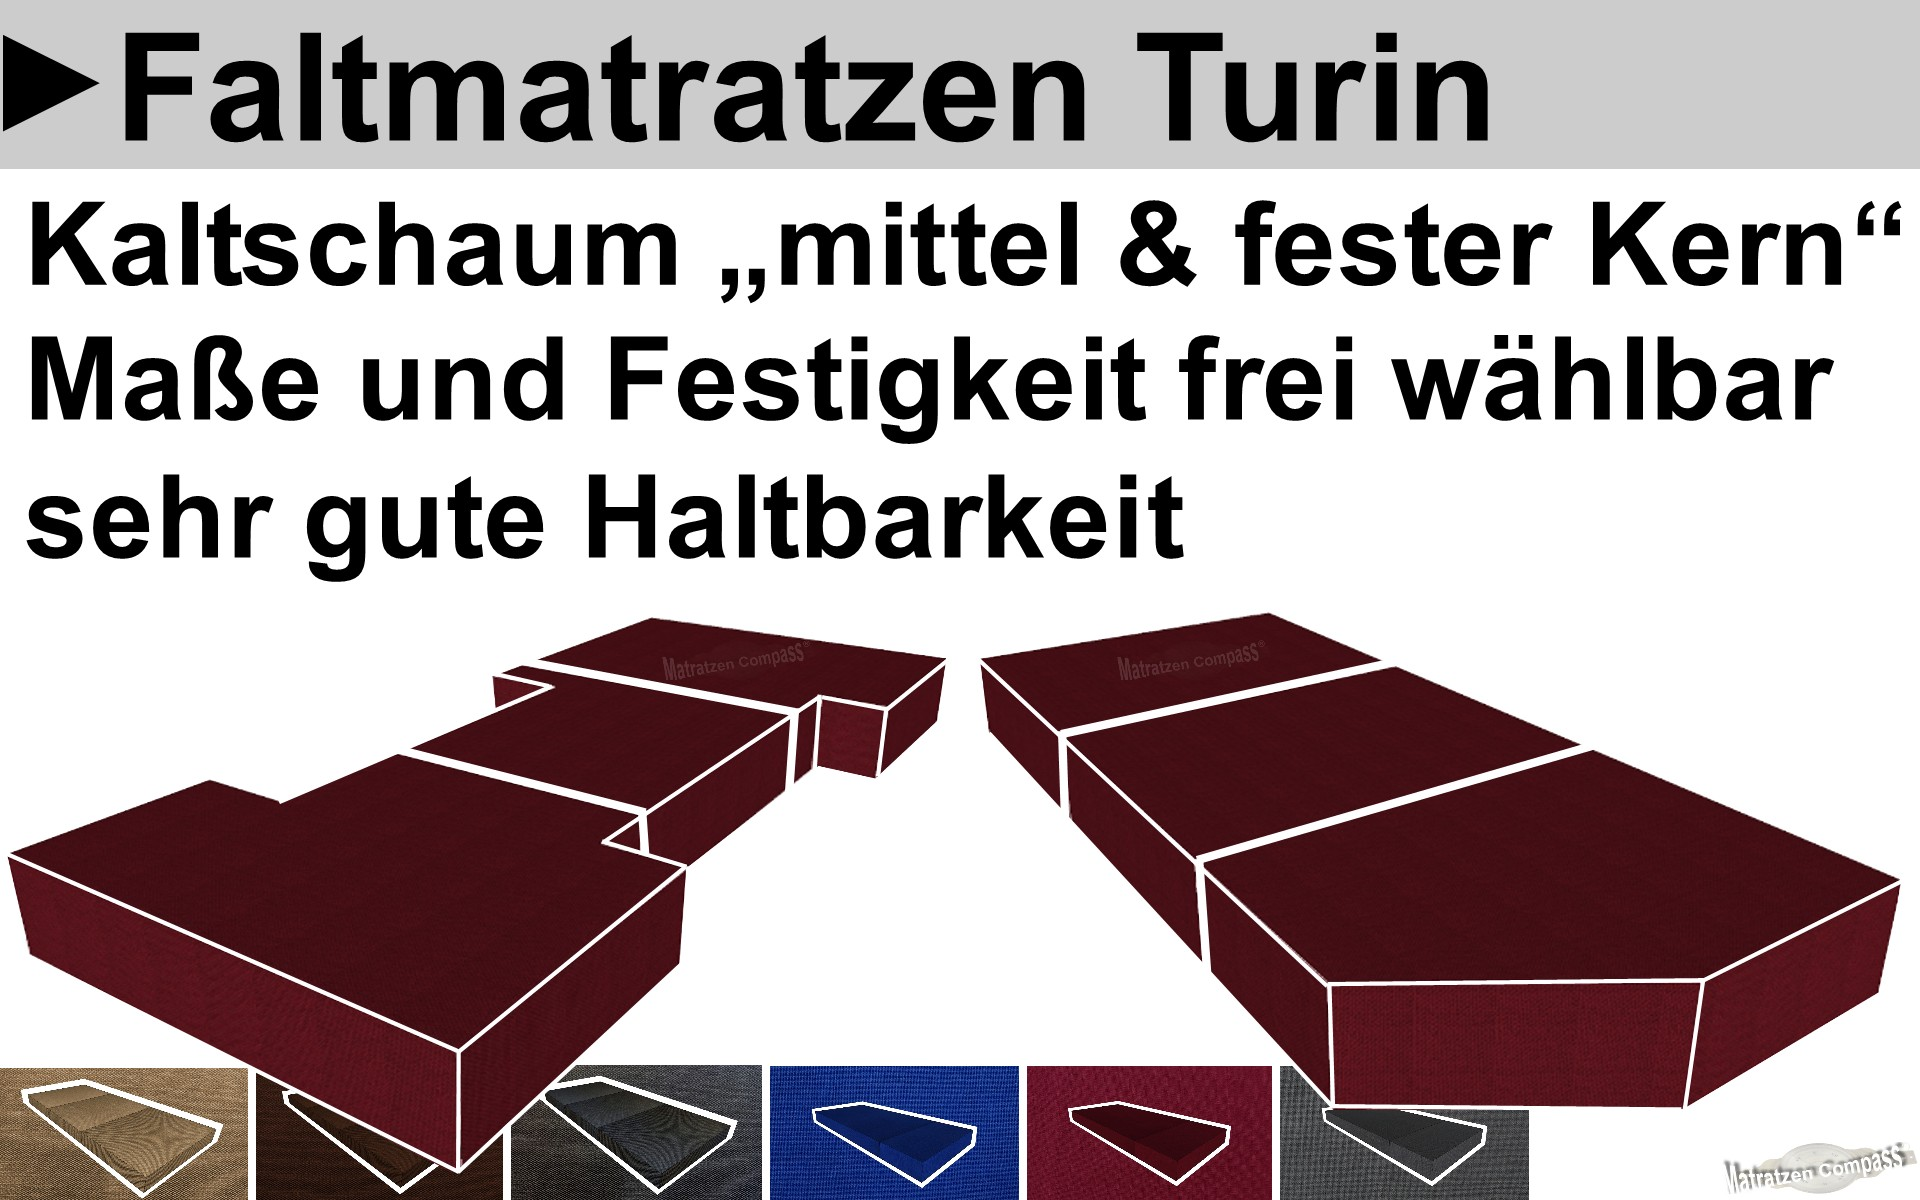 Faltmatratze-nach-Mass-Turin-Klappmatratze-nach-Mass-Turin-Faltmatratze-Anfertigung-Turin-hochwertige-Faltmatratze-Klappmatratze-konfigurieren-TurinL4HK8PRLYih5S